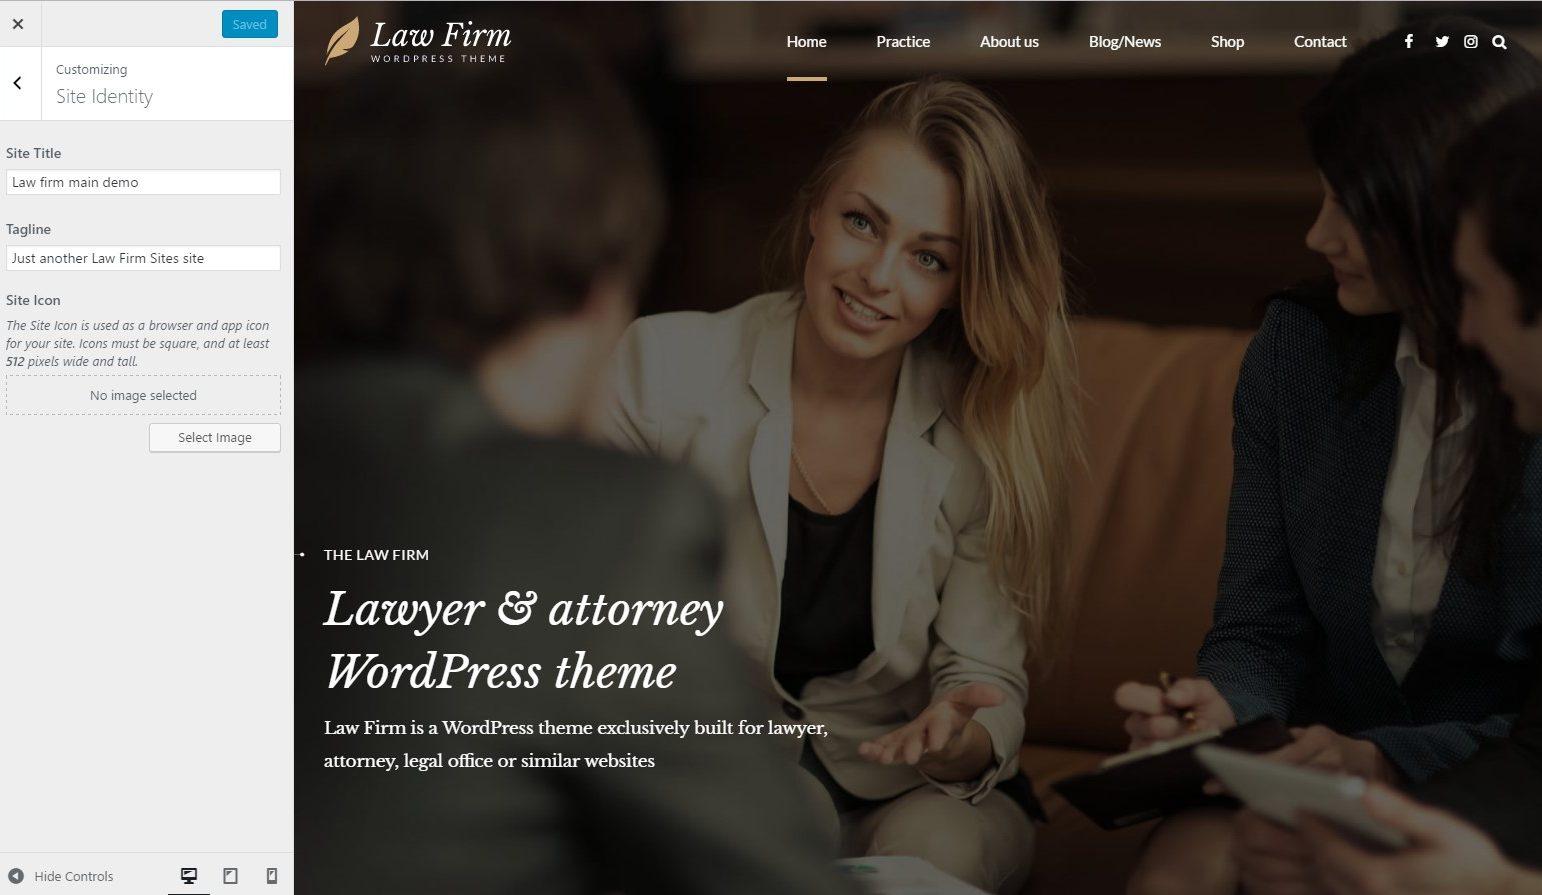 https://documentation.bold-themes.com/law-firm/wp-content/uploads/sites/15/2017/05/19-1-e1496309899660.jpg